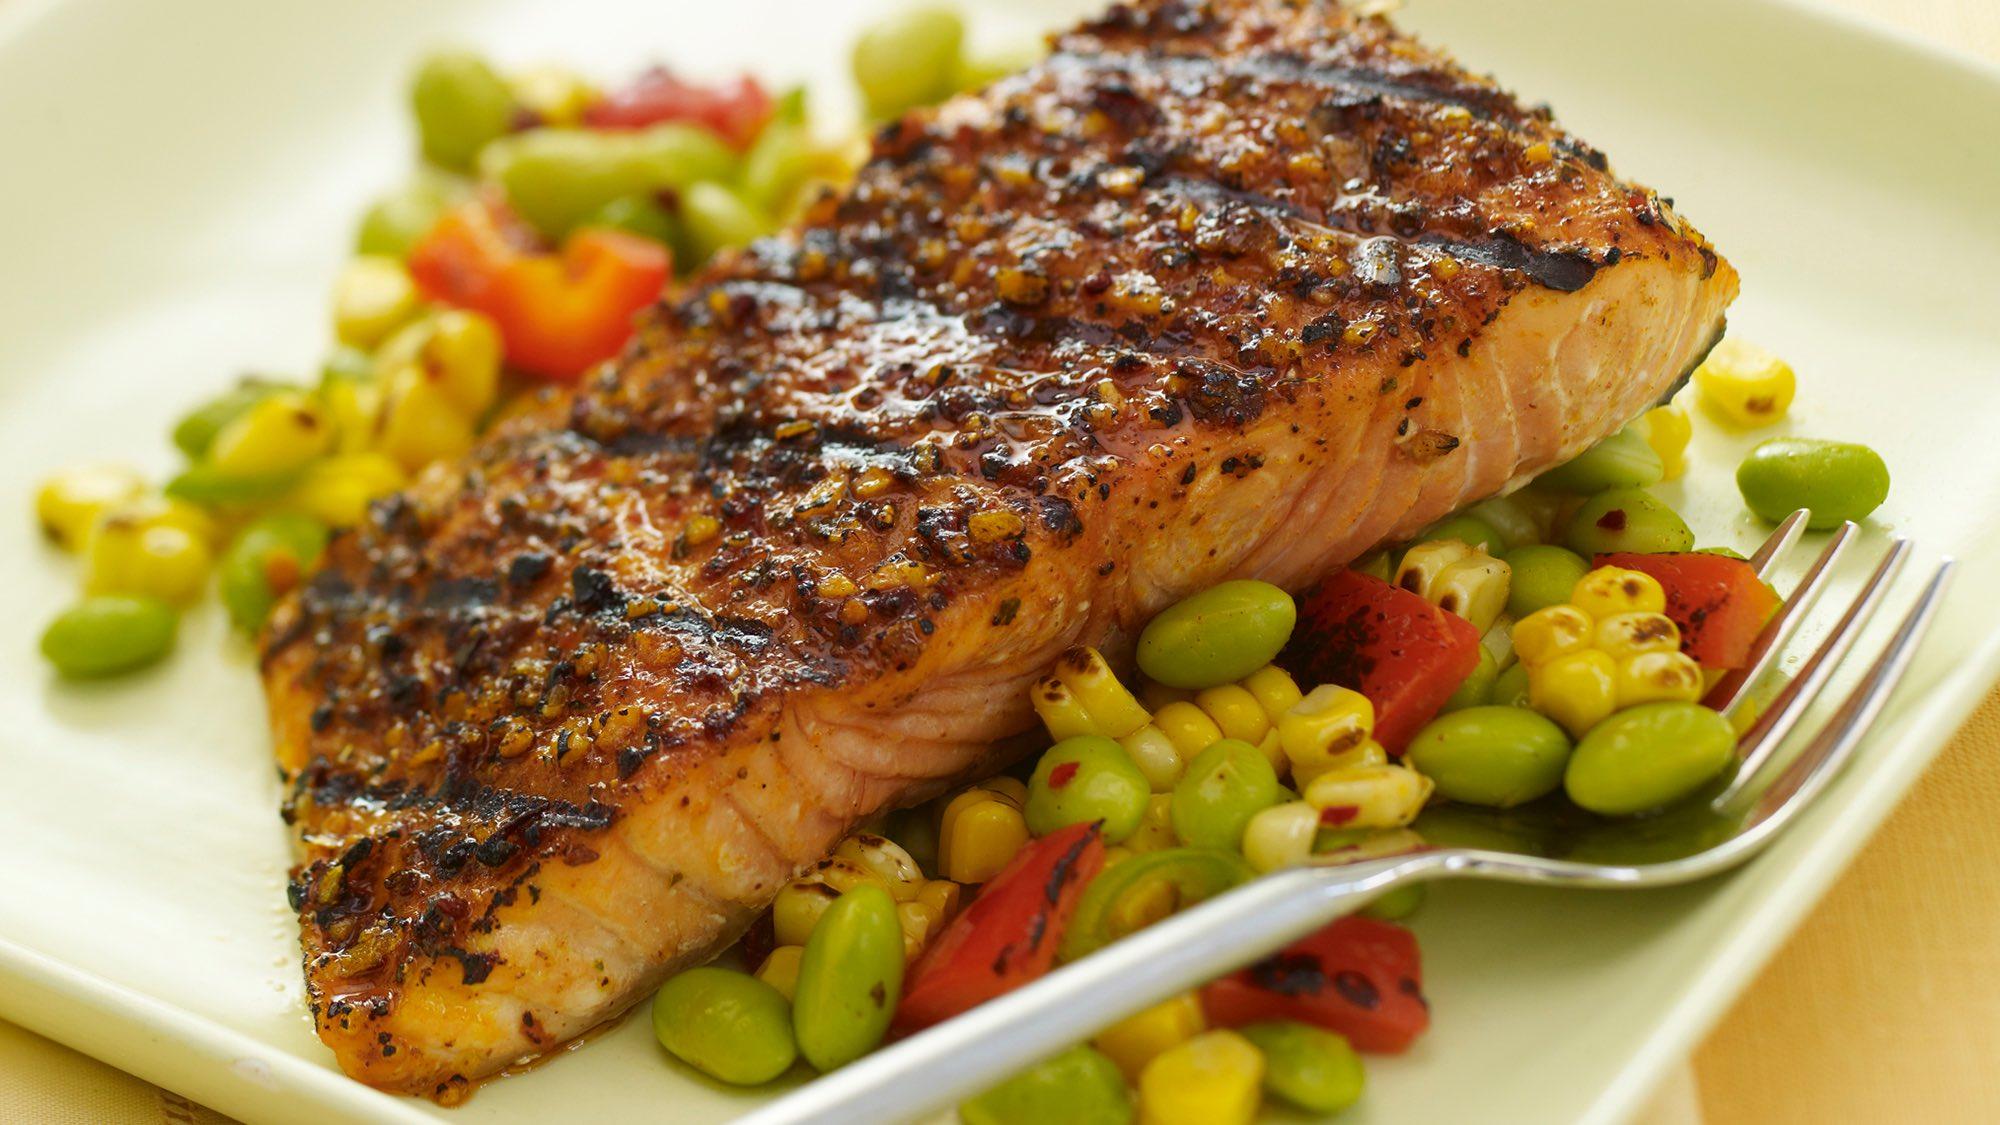 hot-pepper-blackened-salmon-with-grilled-corn-succotash.jpg